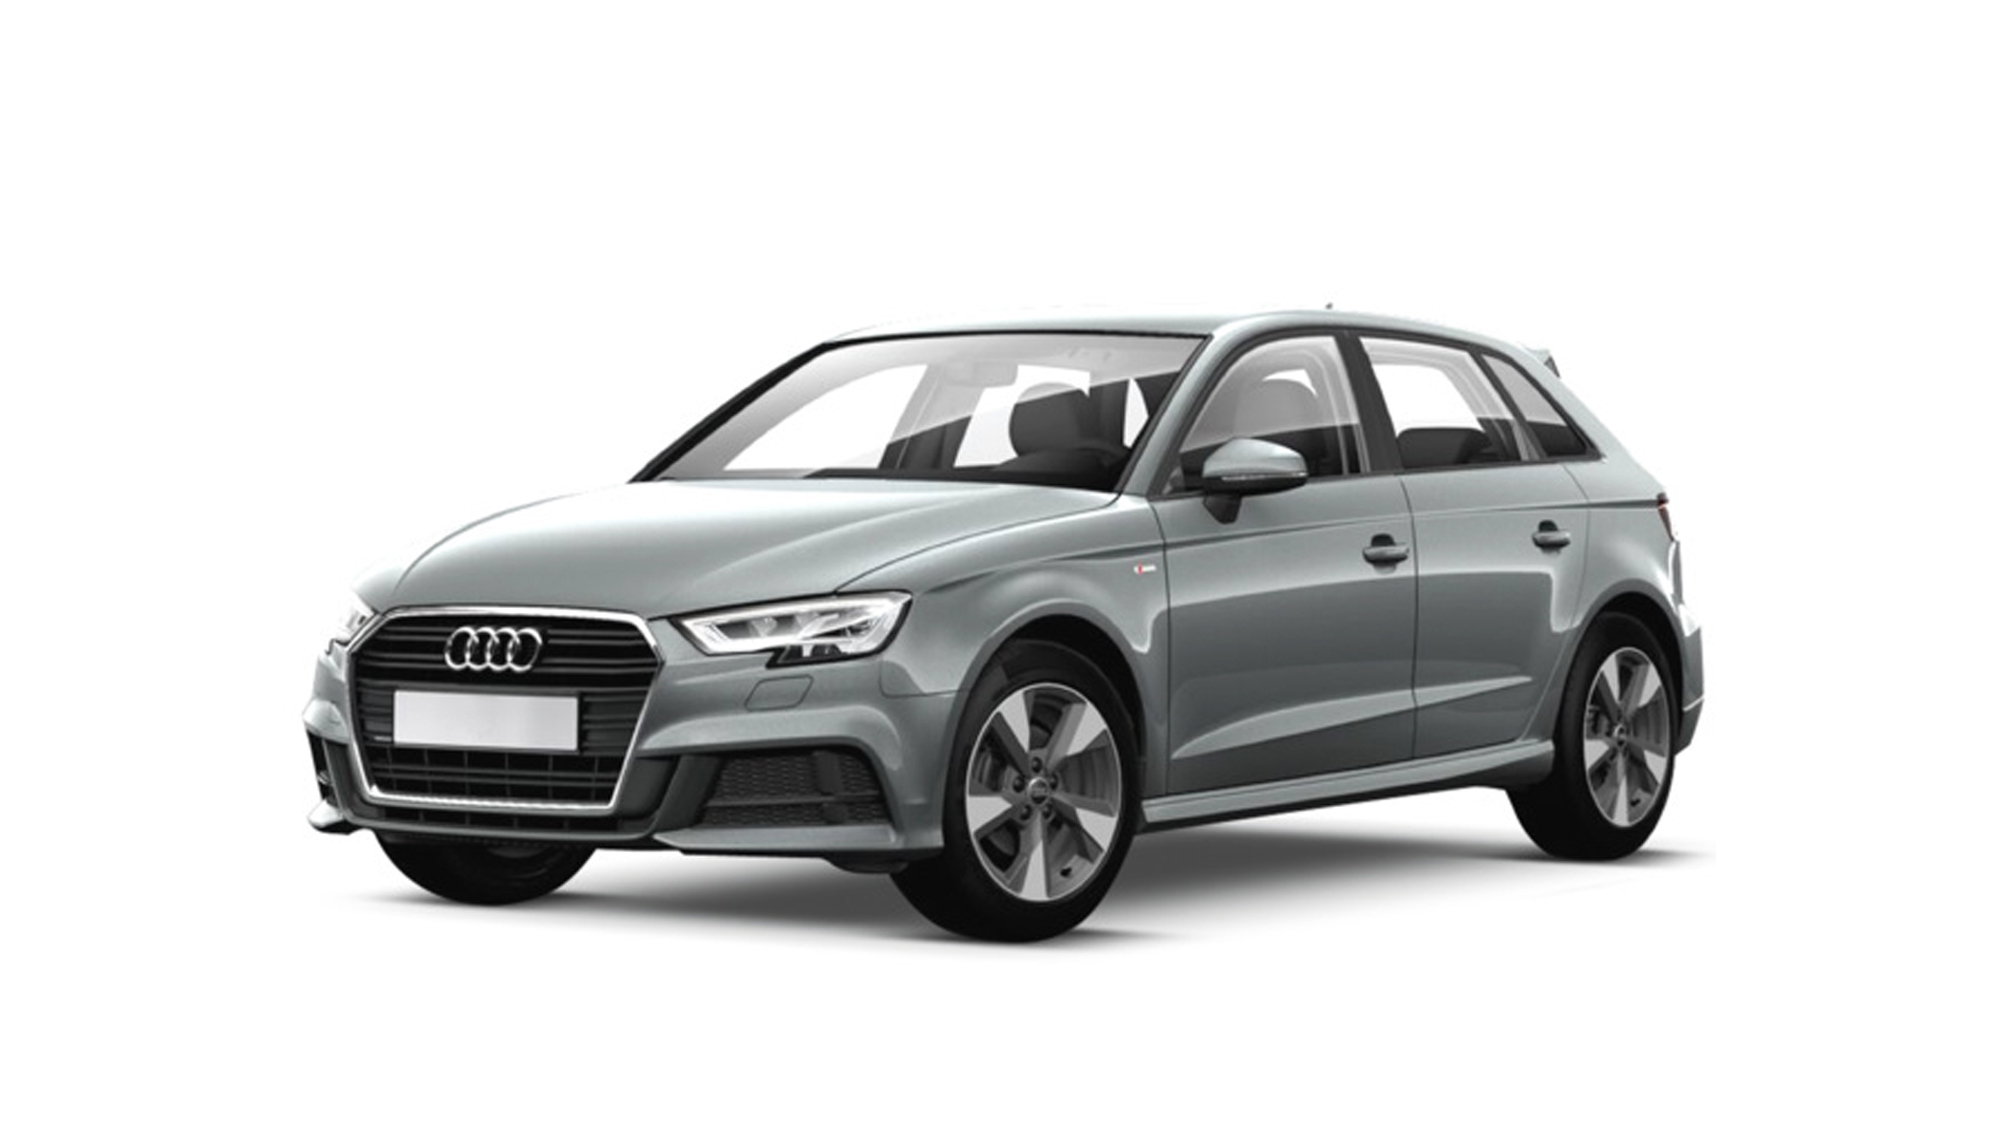 Audi A3 3.0 TDI